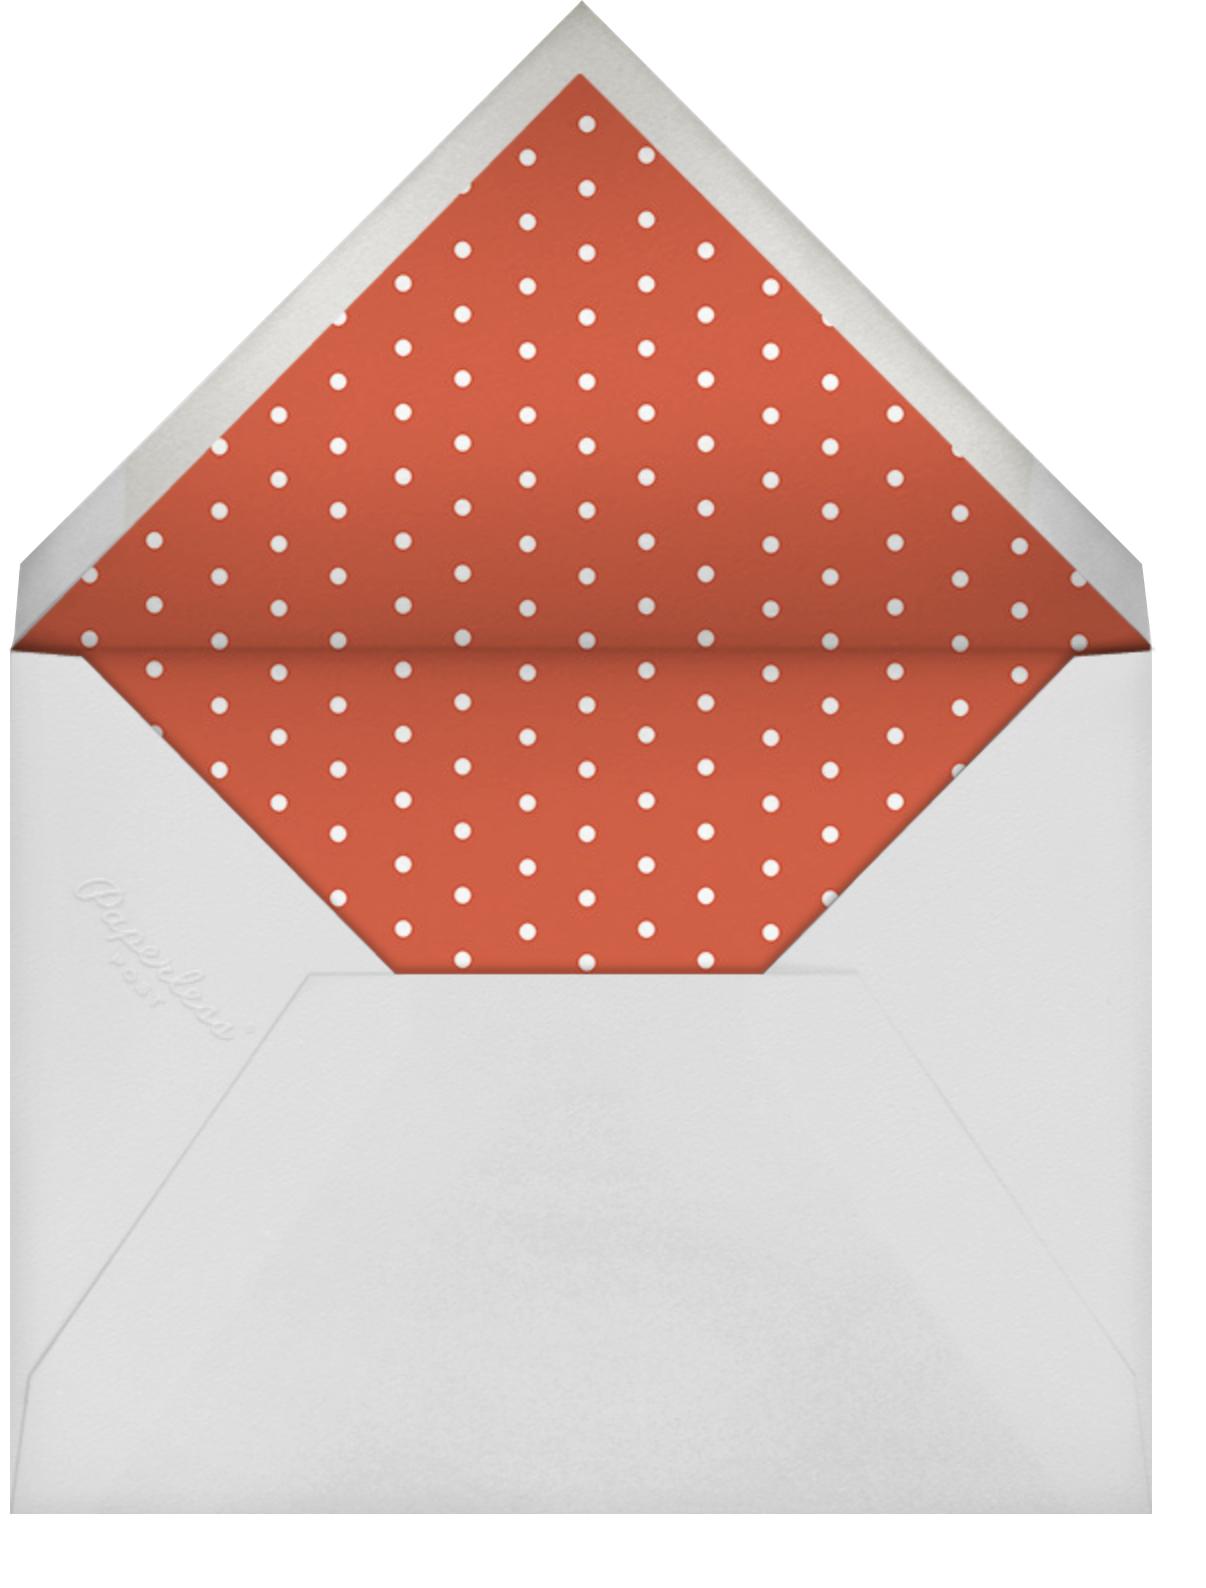 Zebra Stripes (Brown)  - Paperless Post - Adult birthday - envelope back